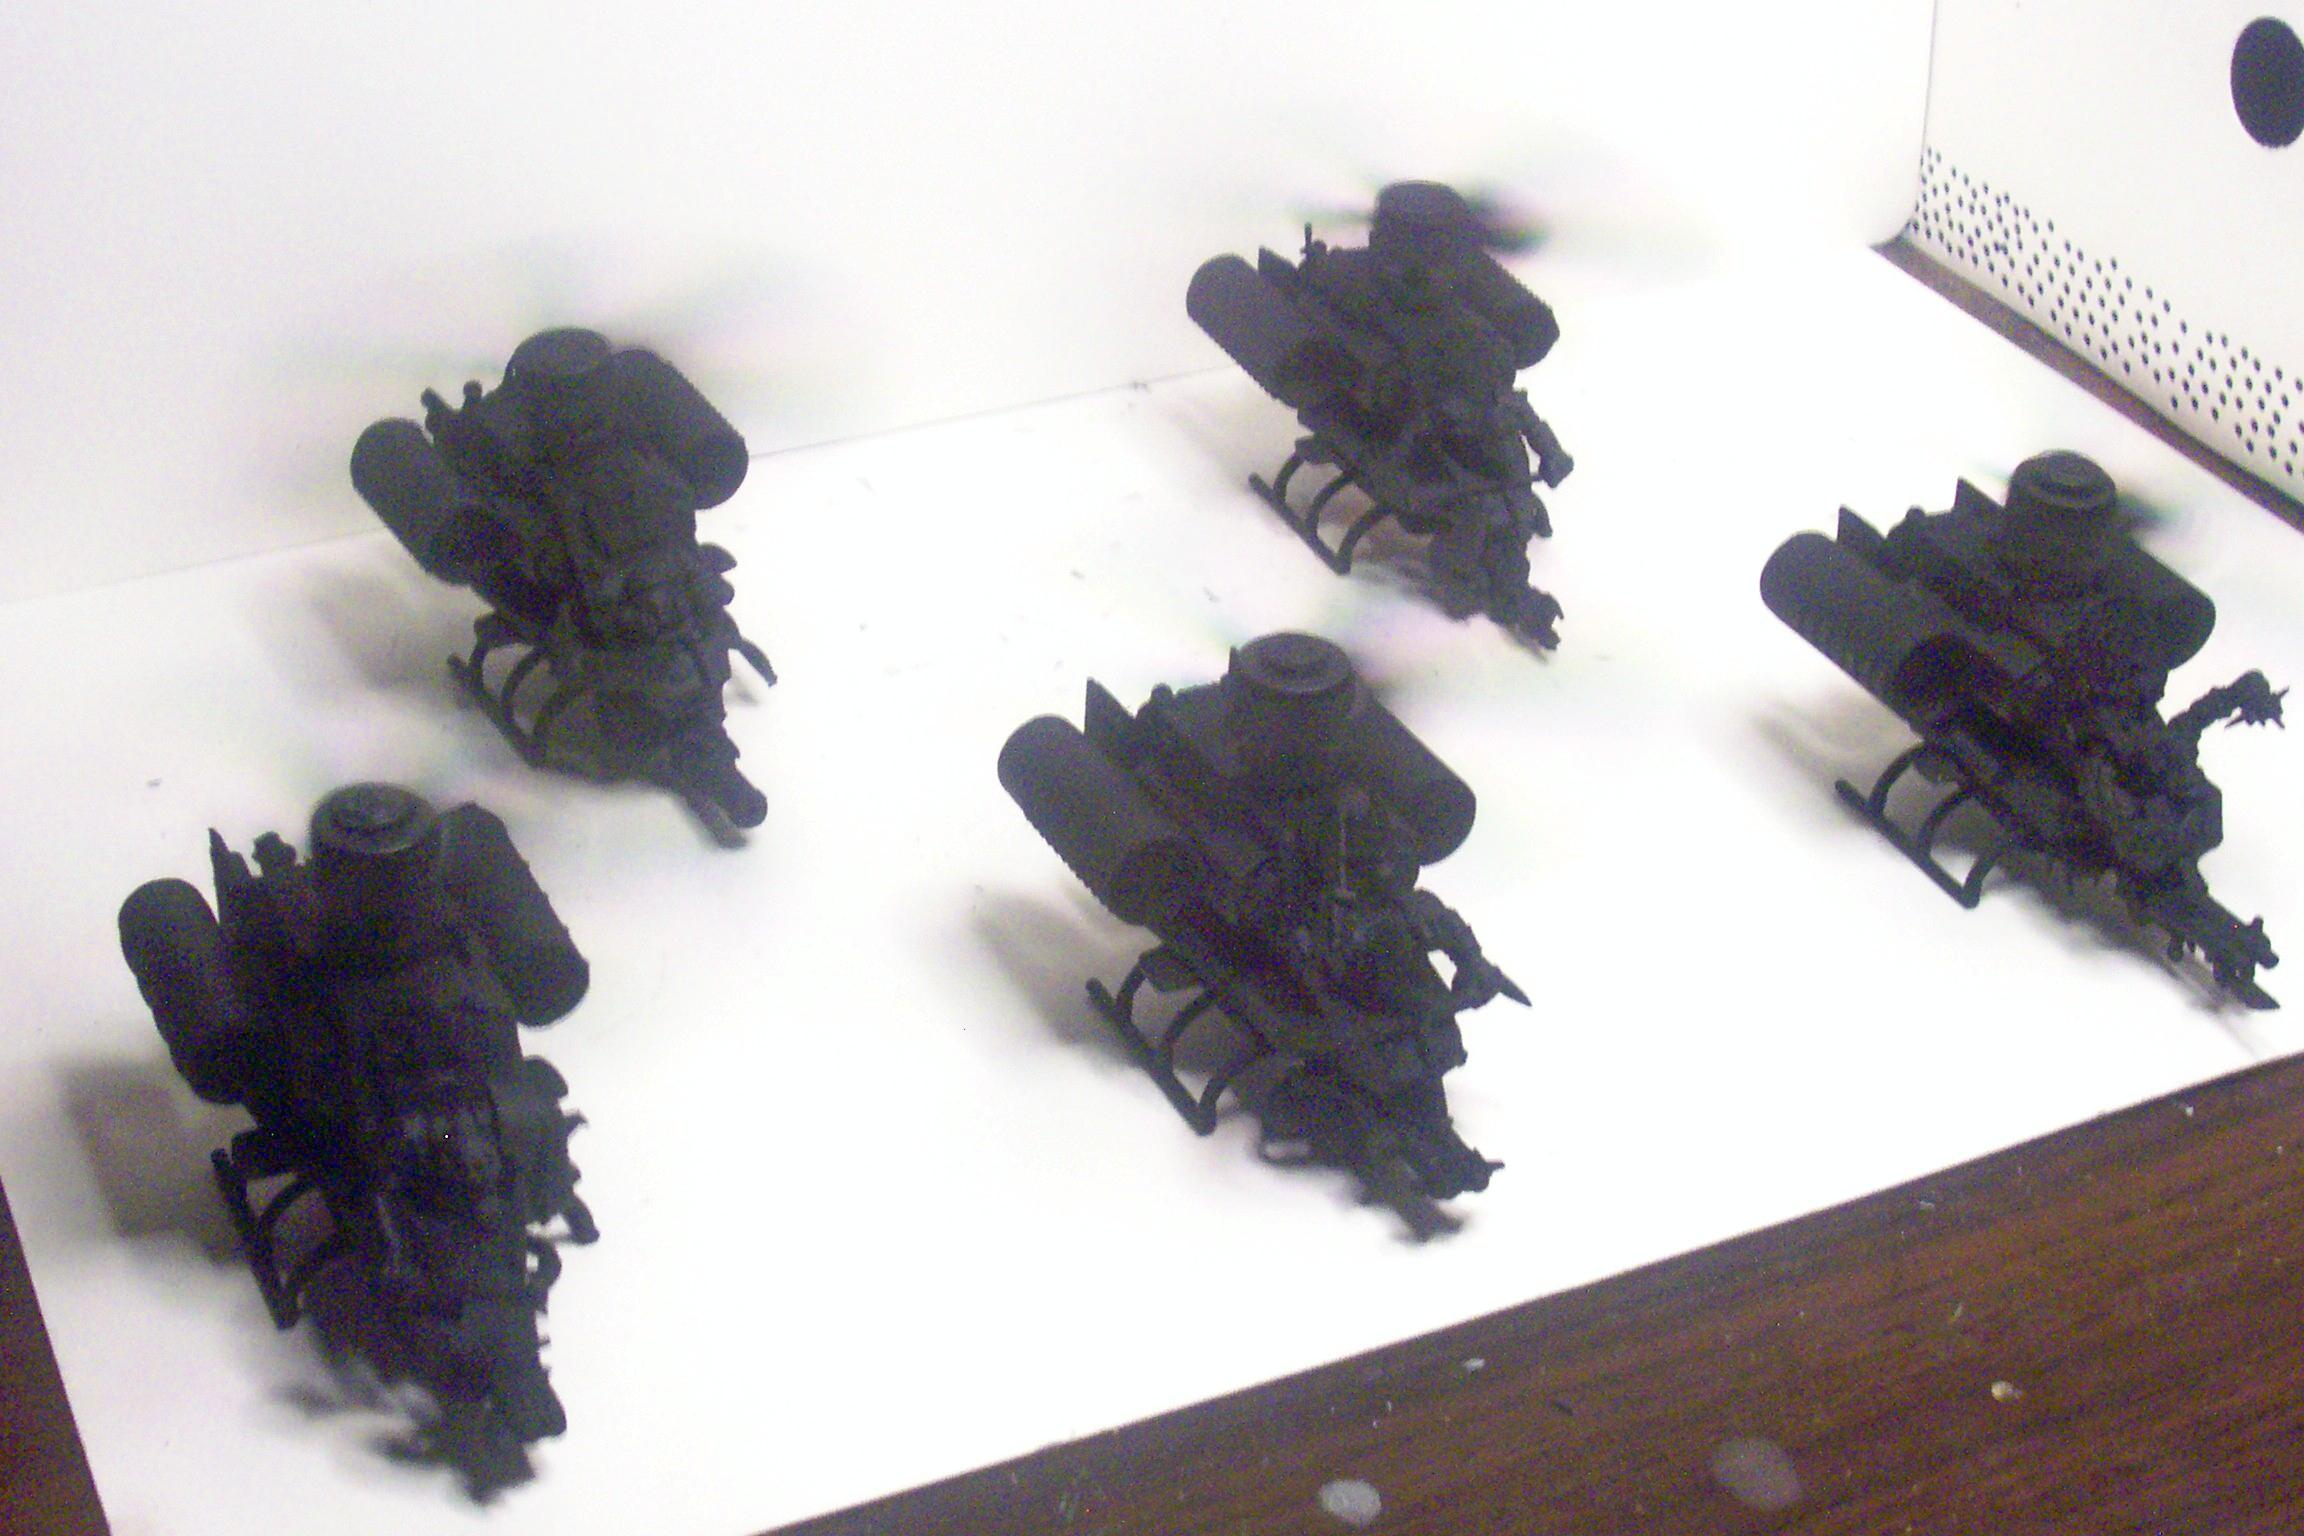 Conversion, Deffkopta, Orks, Primered, Toy, Warhammer 40,000